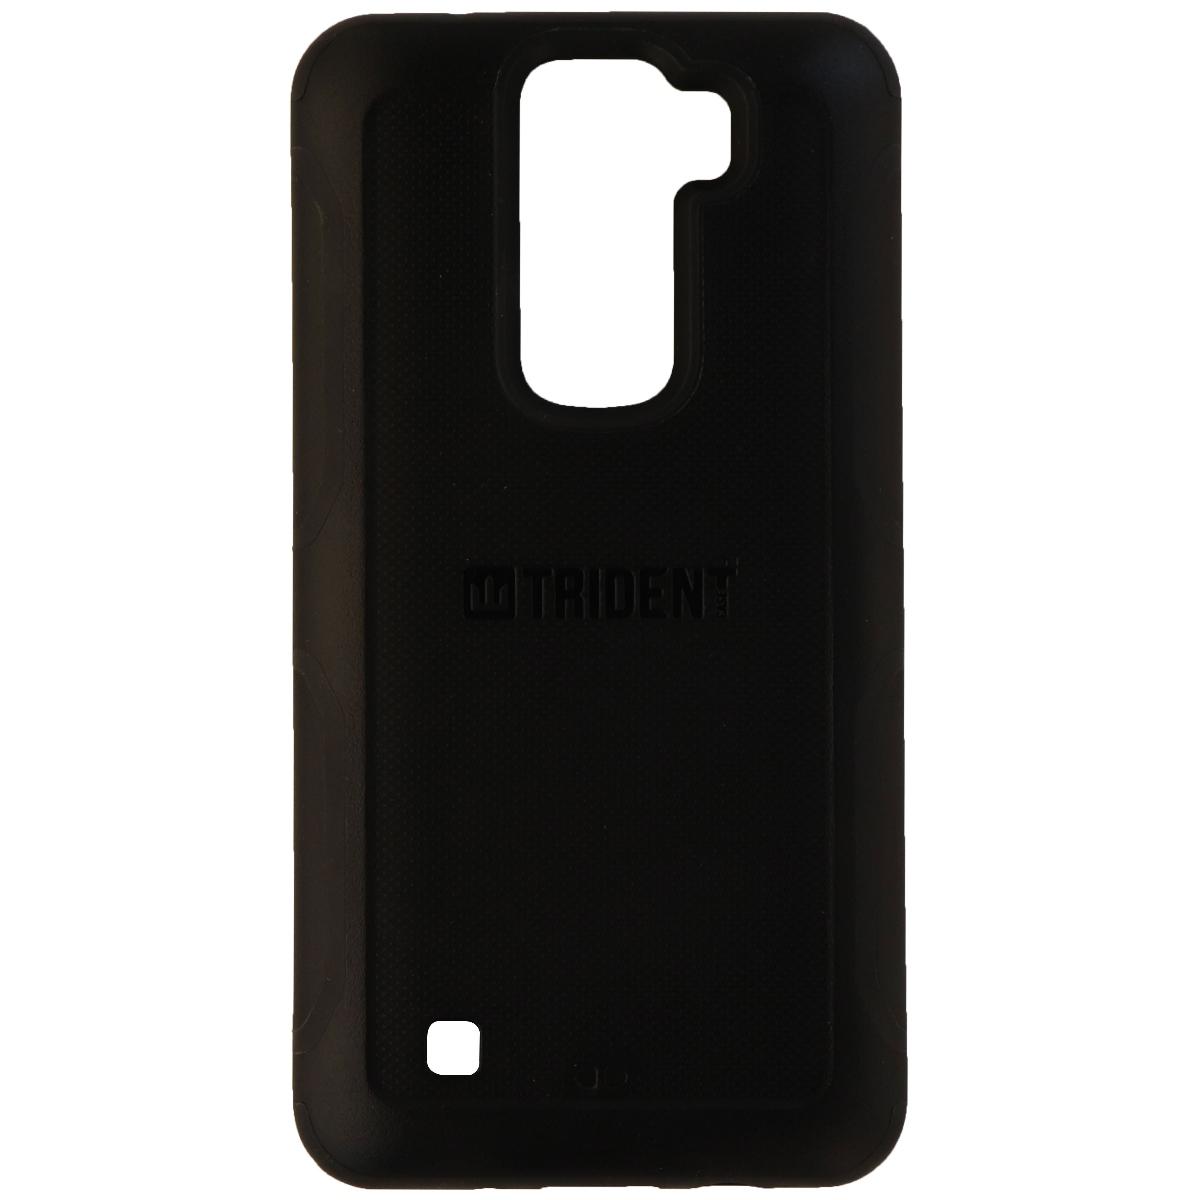 Trident Aegis Series Protective Case Cover for LG K8 / K8 V - Black